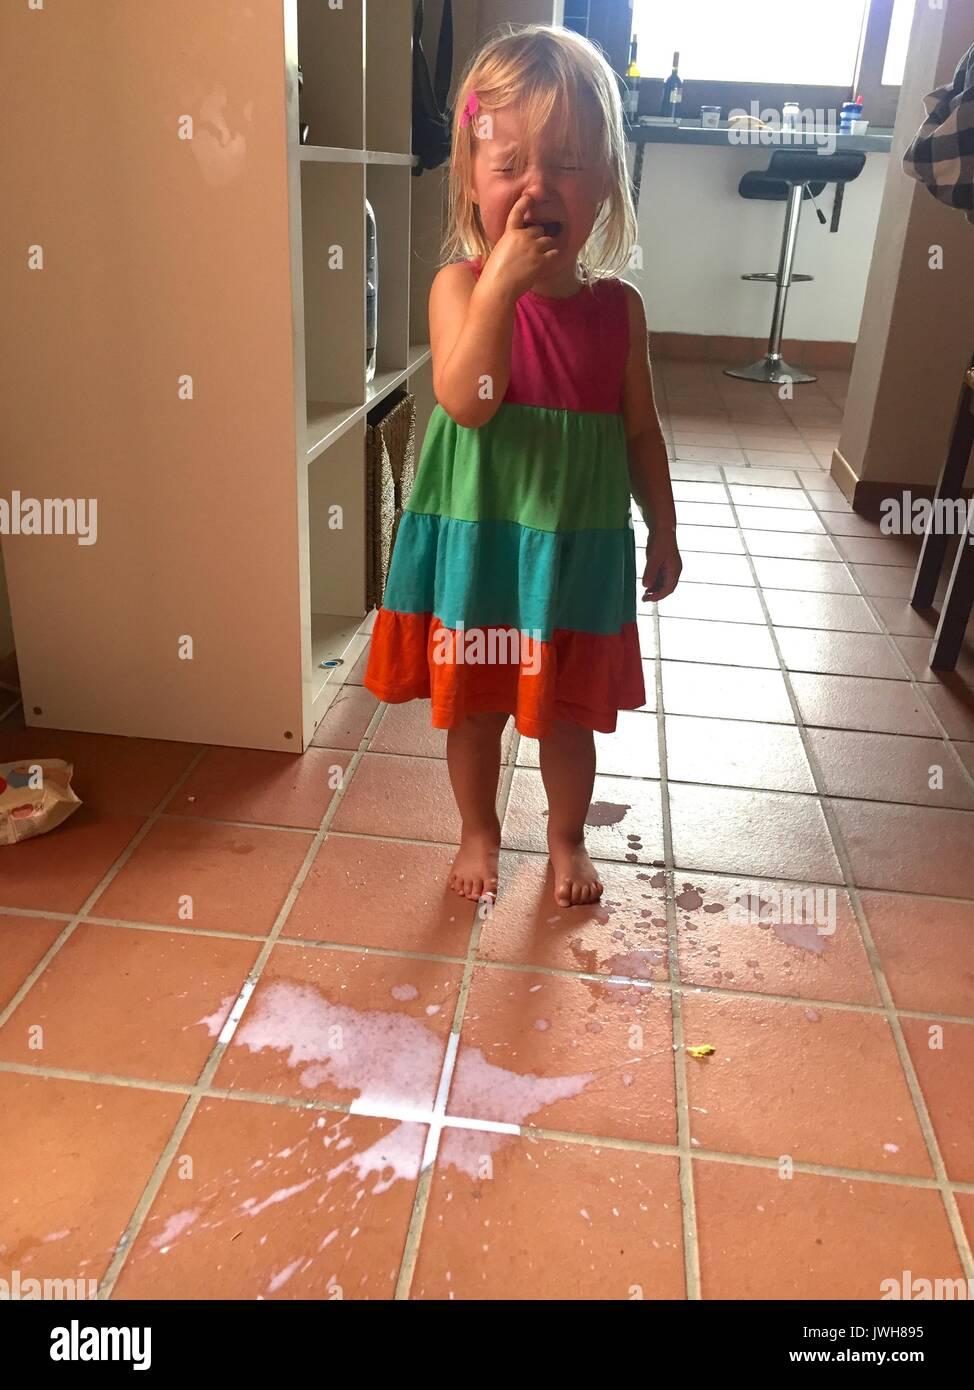 Don't cry over spilt milk - Stock Image